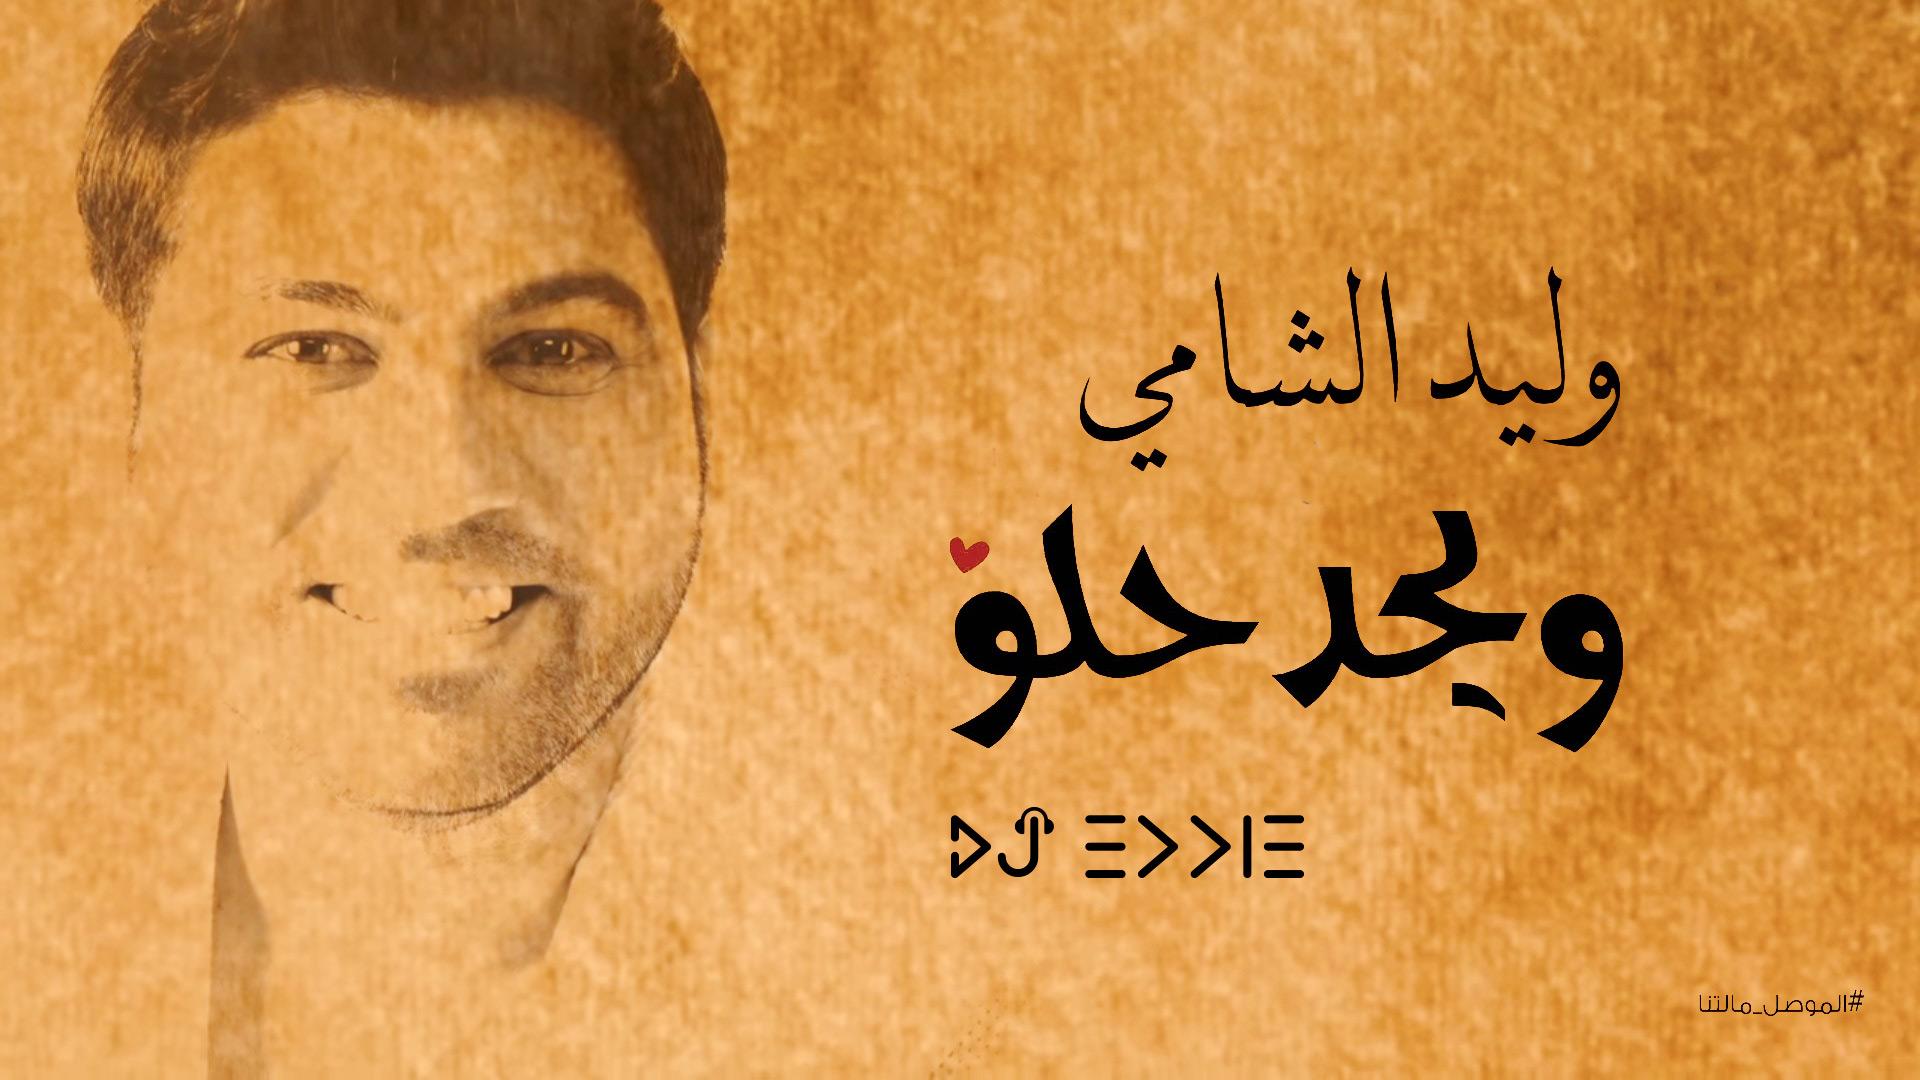 Waleed Al Shami - Wehid Hiloo وليد الشامي - ويحد حلو